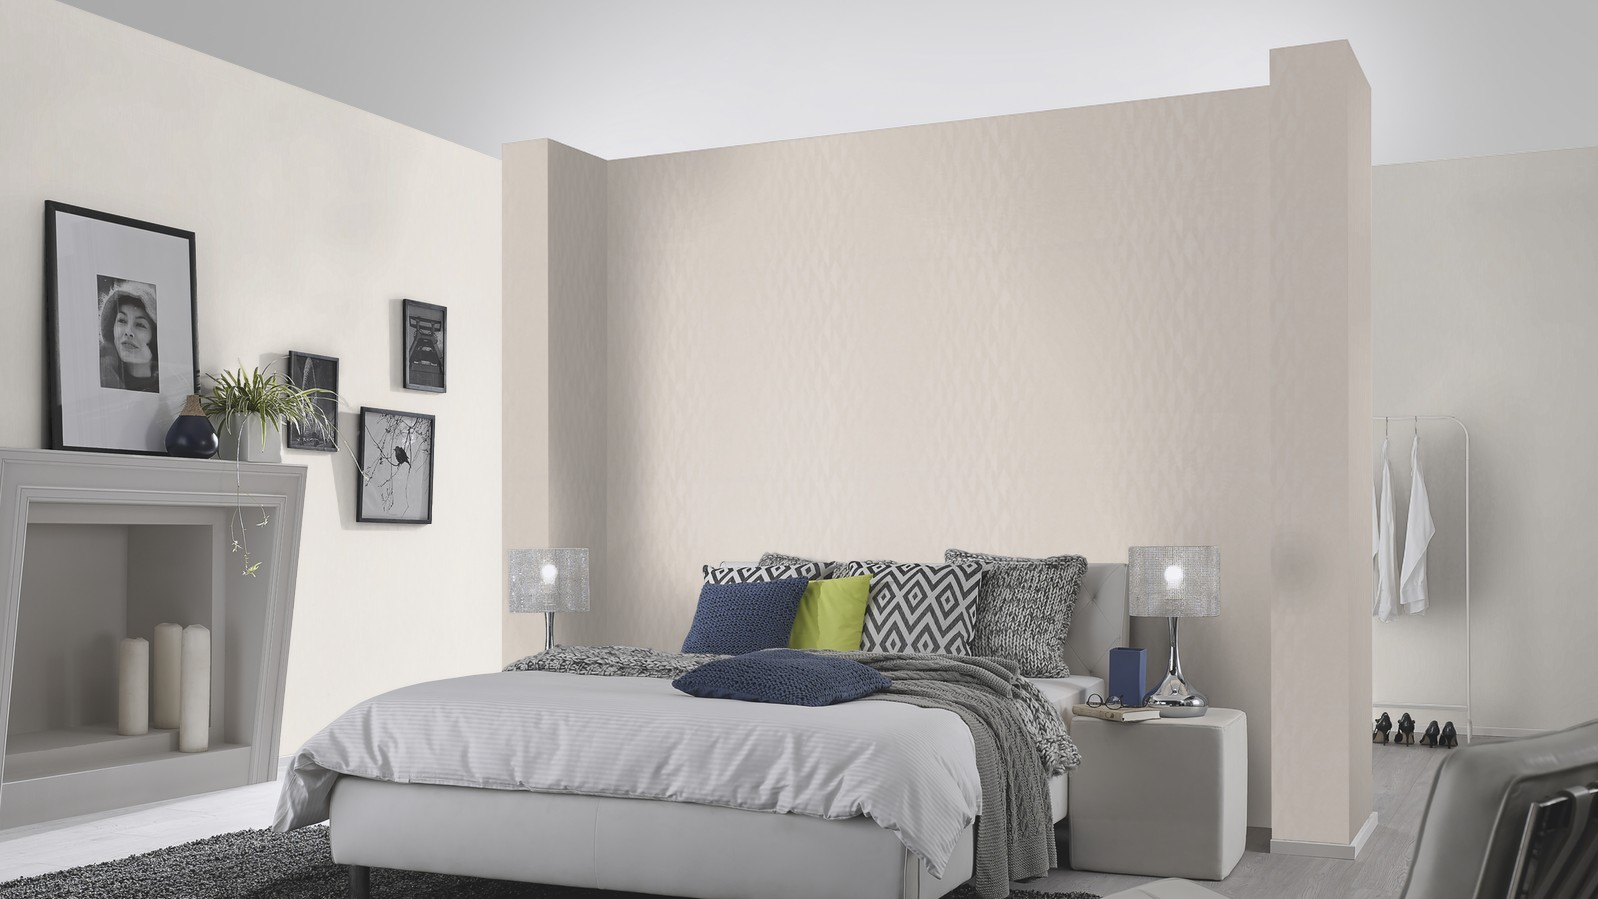 Обои Erismann GMK Fashion for Walls New 10049-26 (Эрисман)